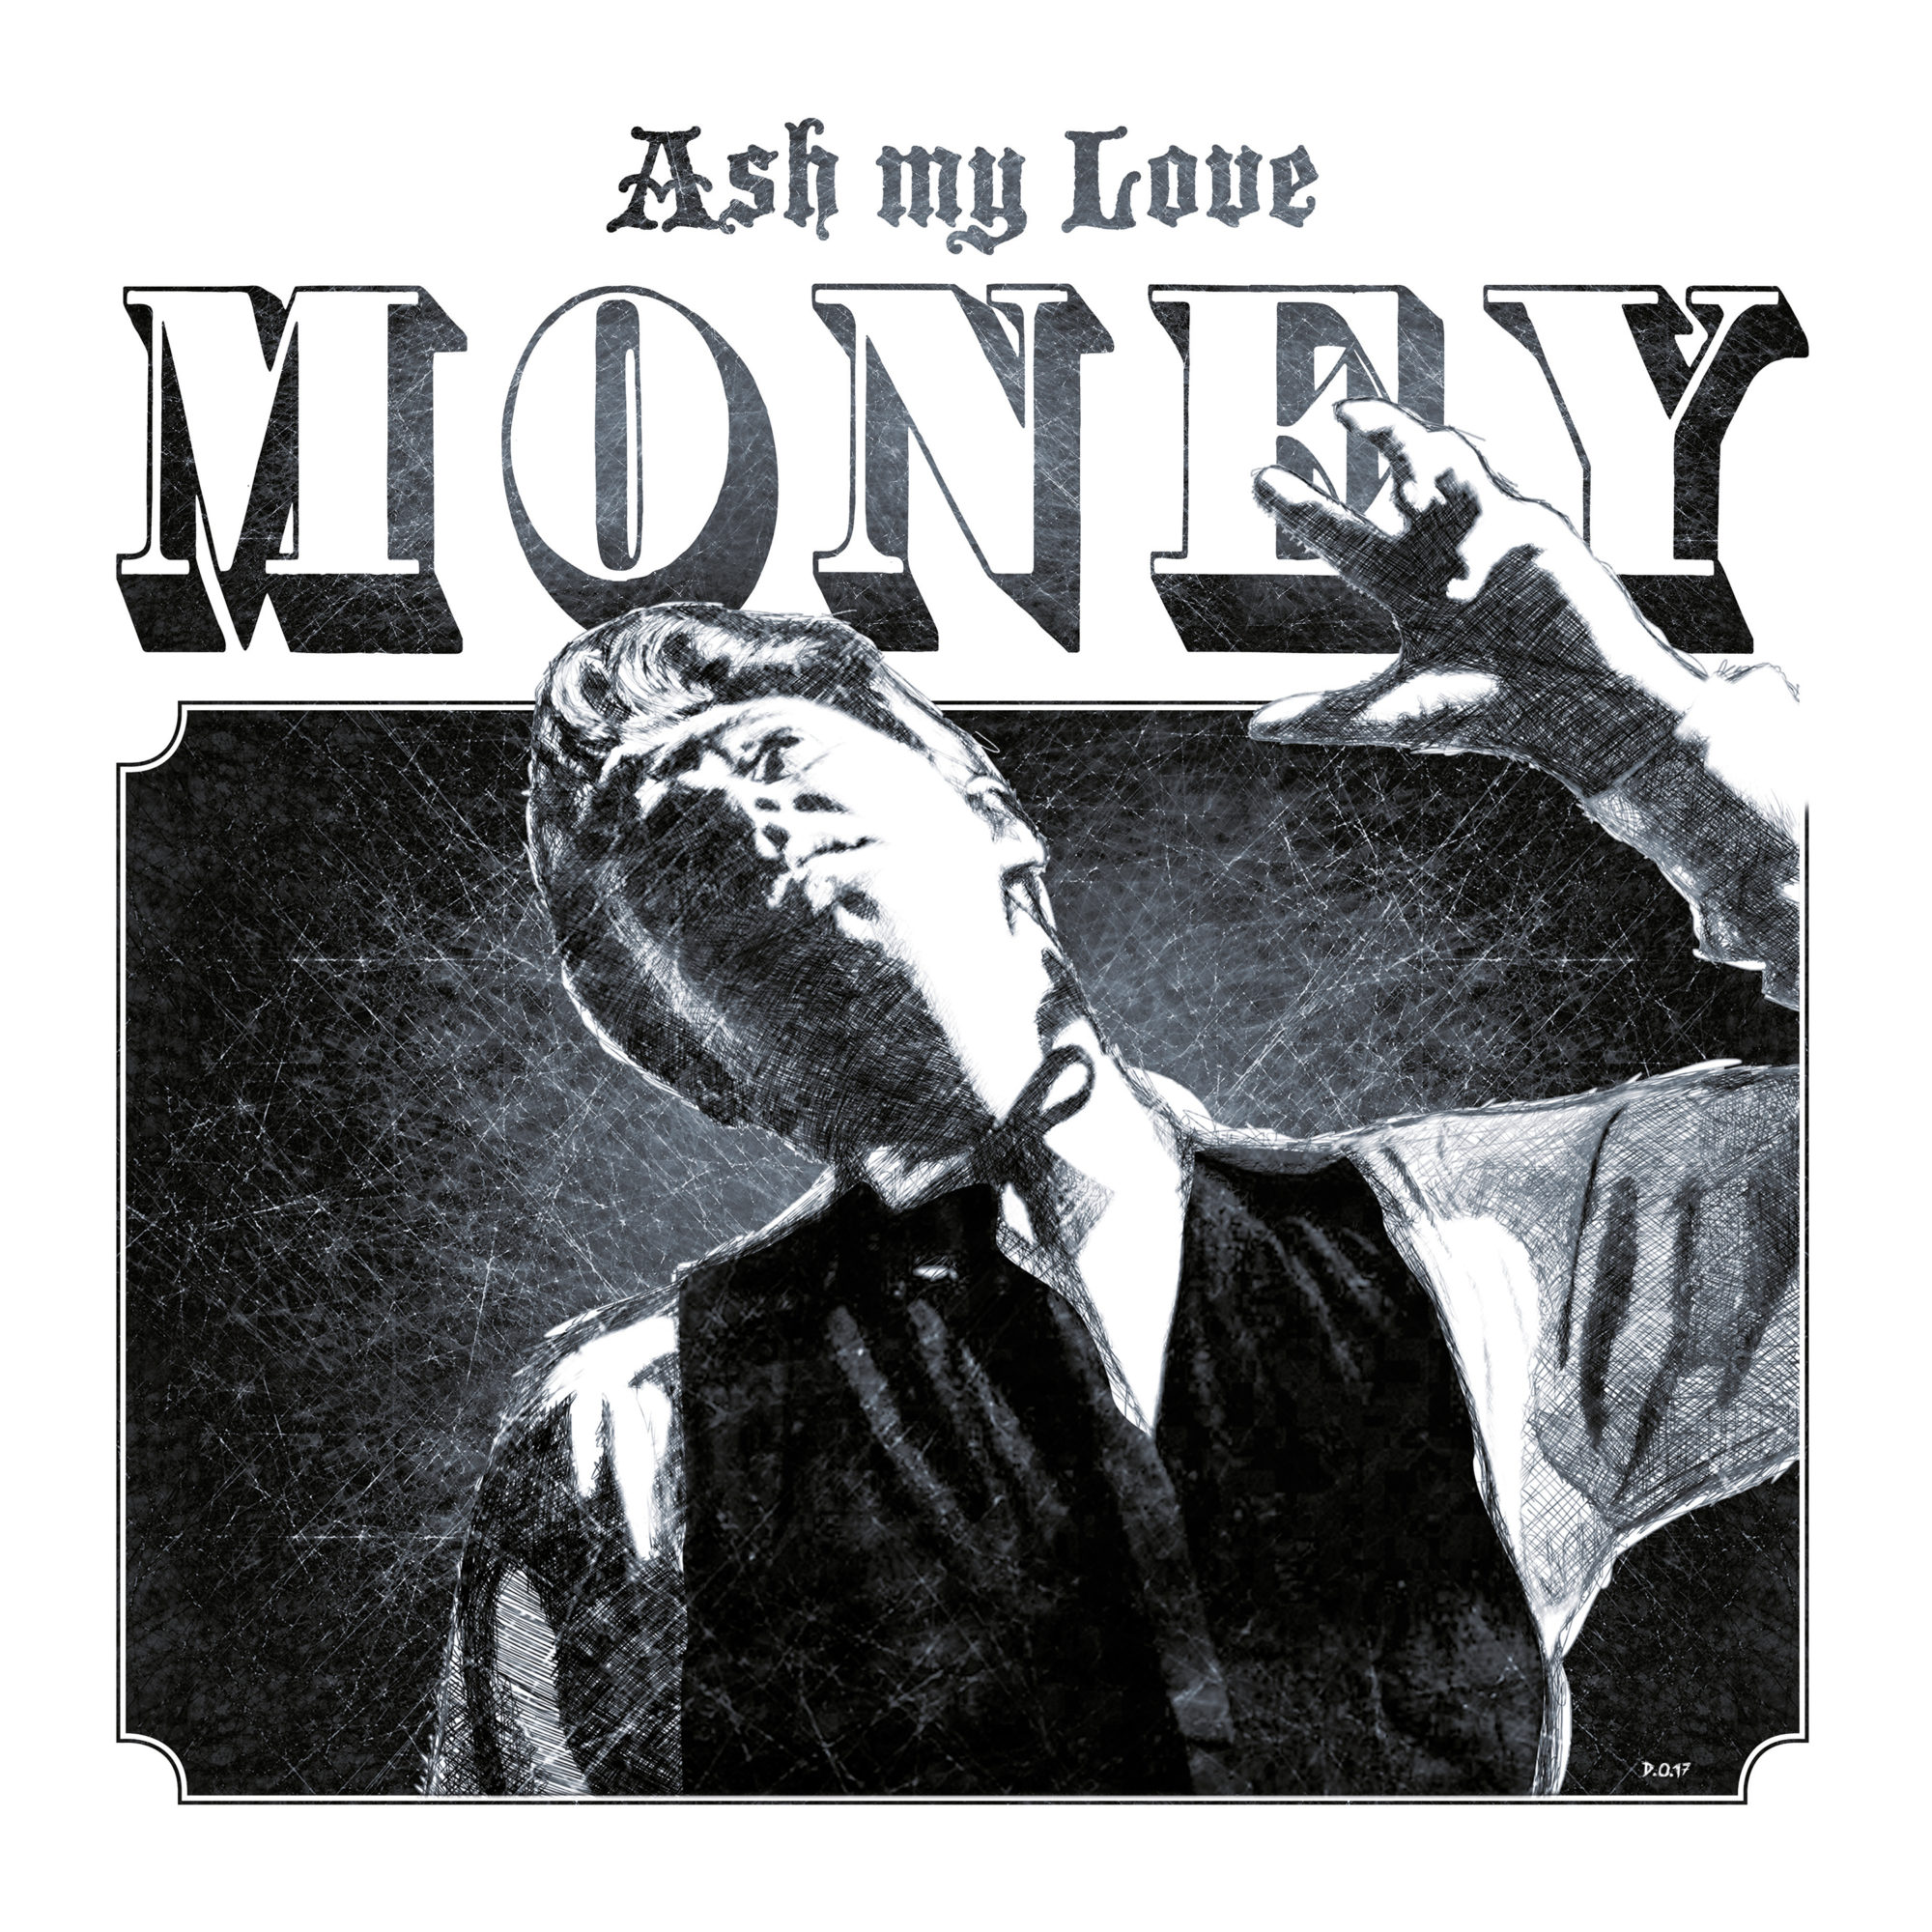 Ash My Love Band Money Album Cover Artwork Music Austria